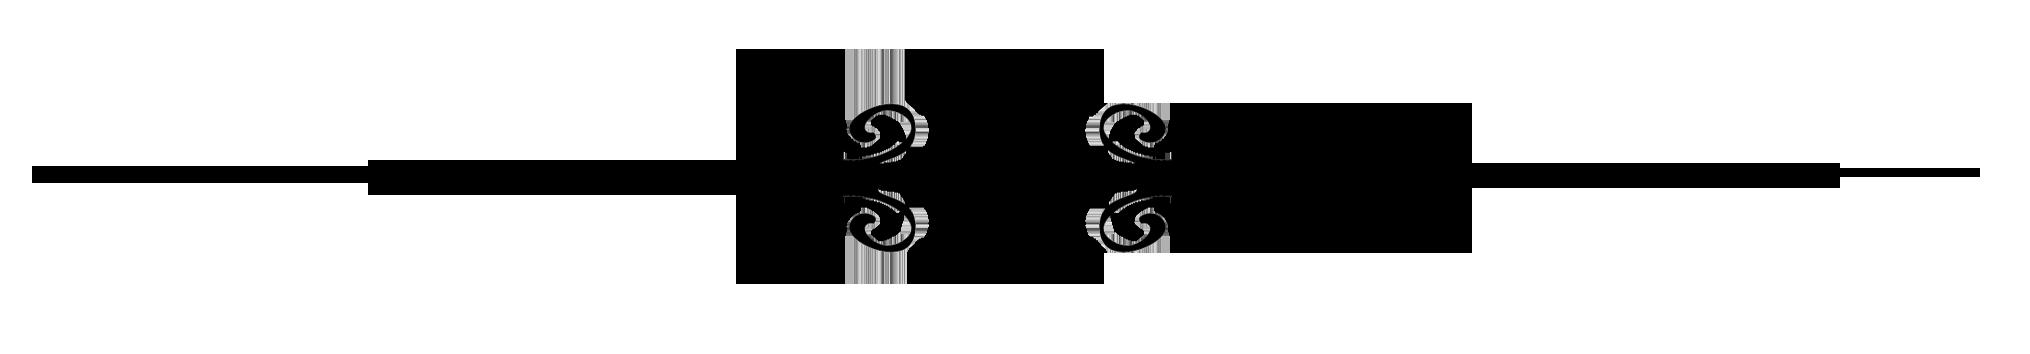 Line Design Clipart Png.